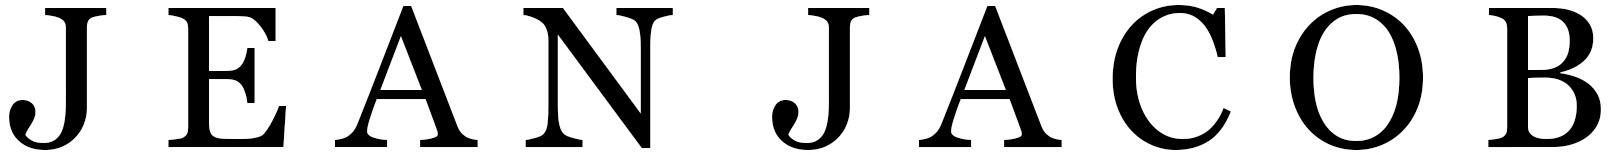 JEAN JACOB